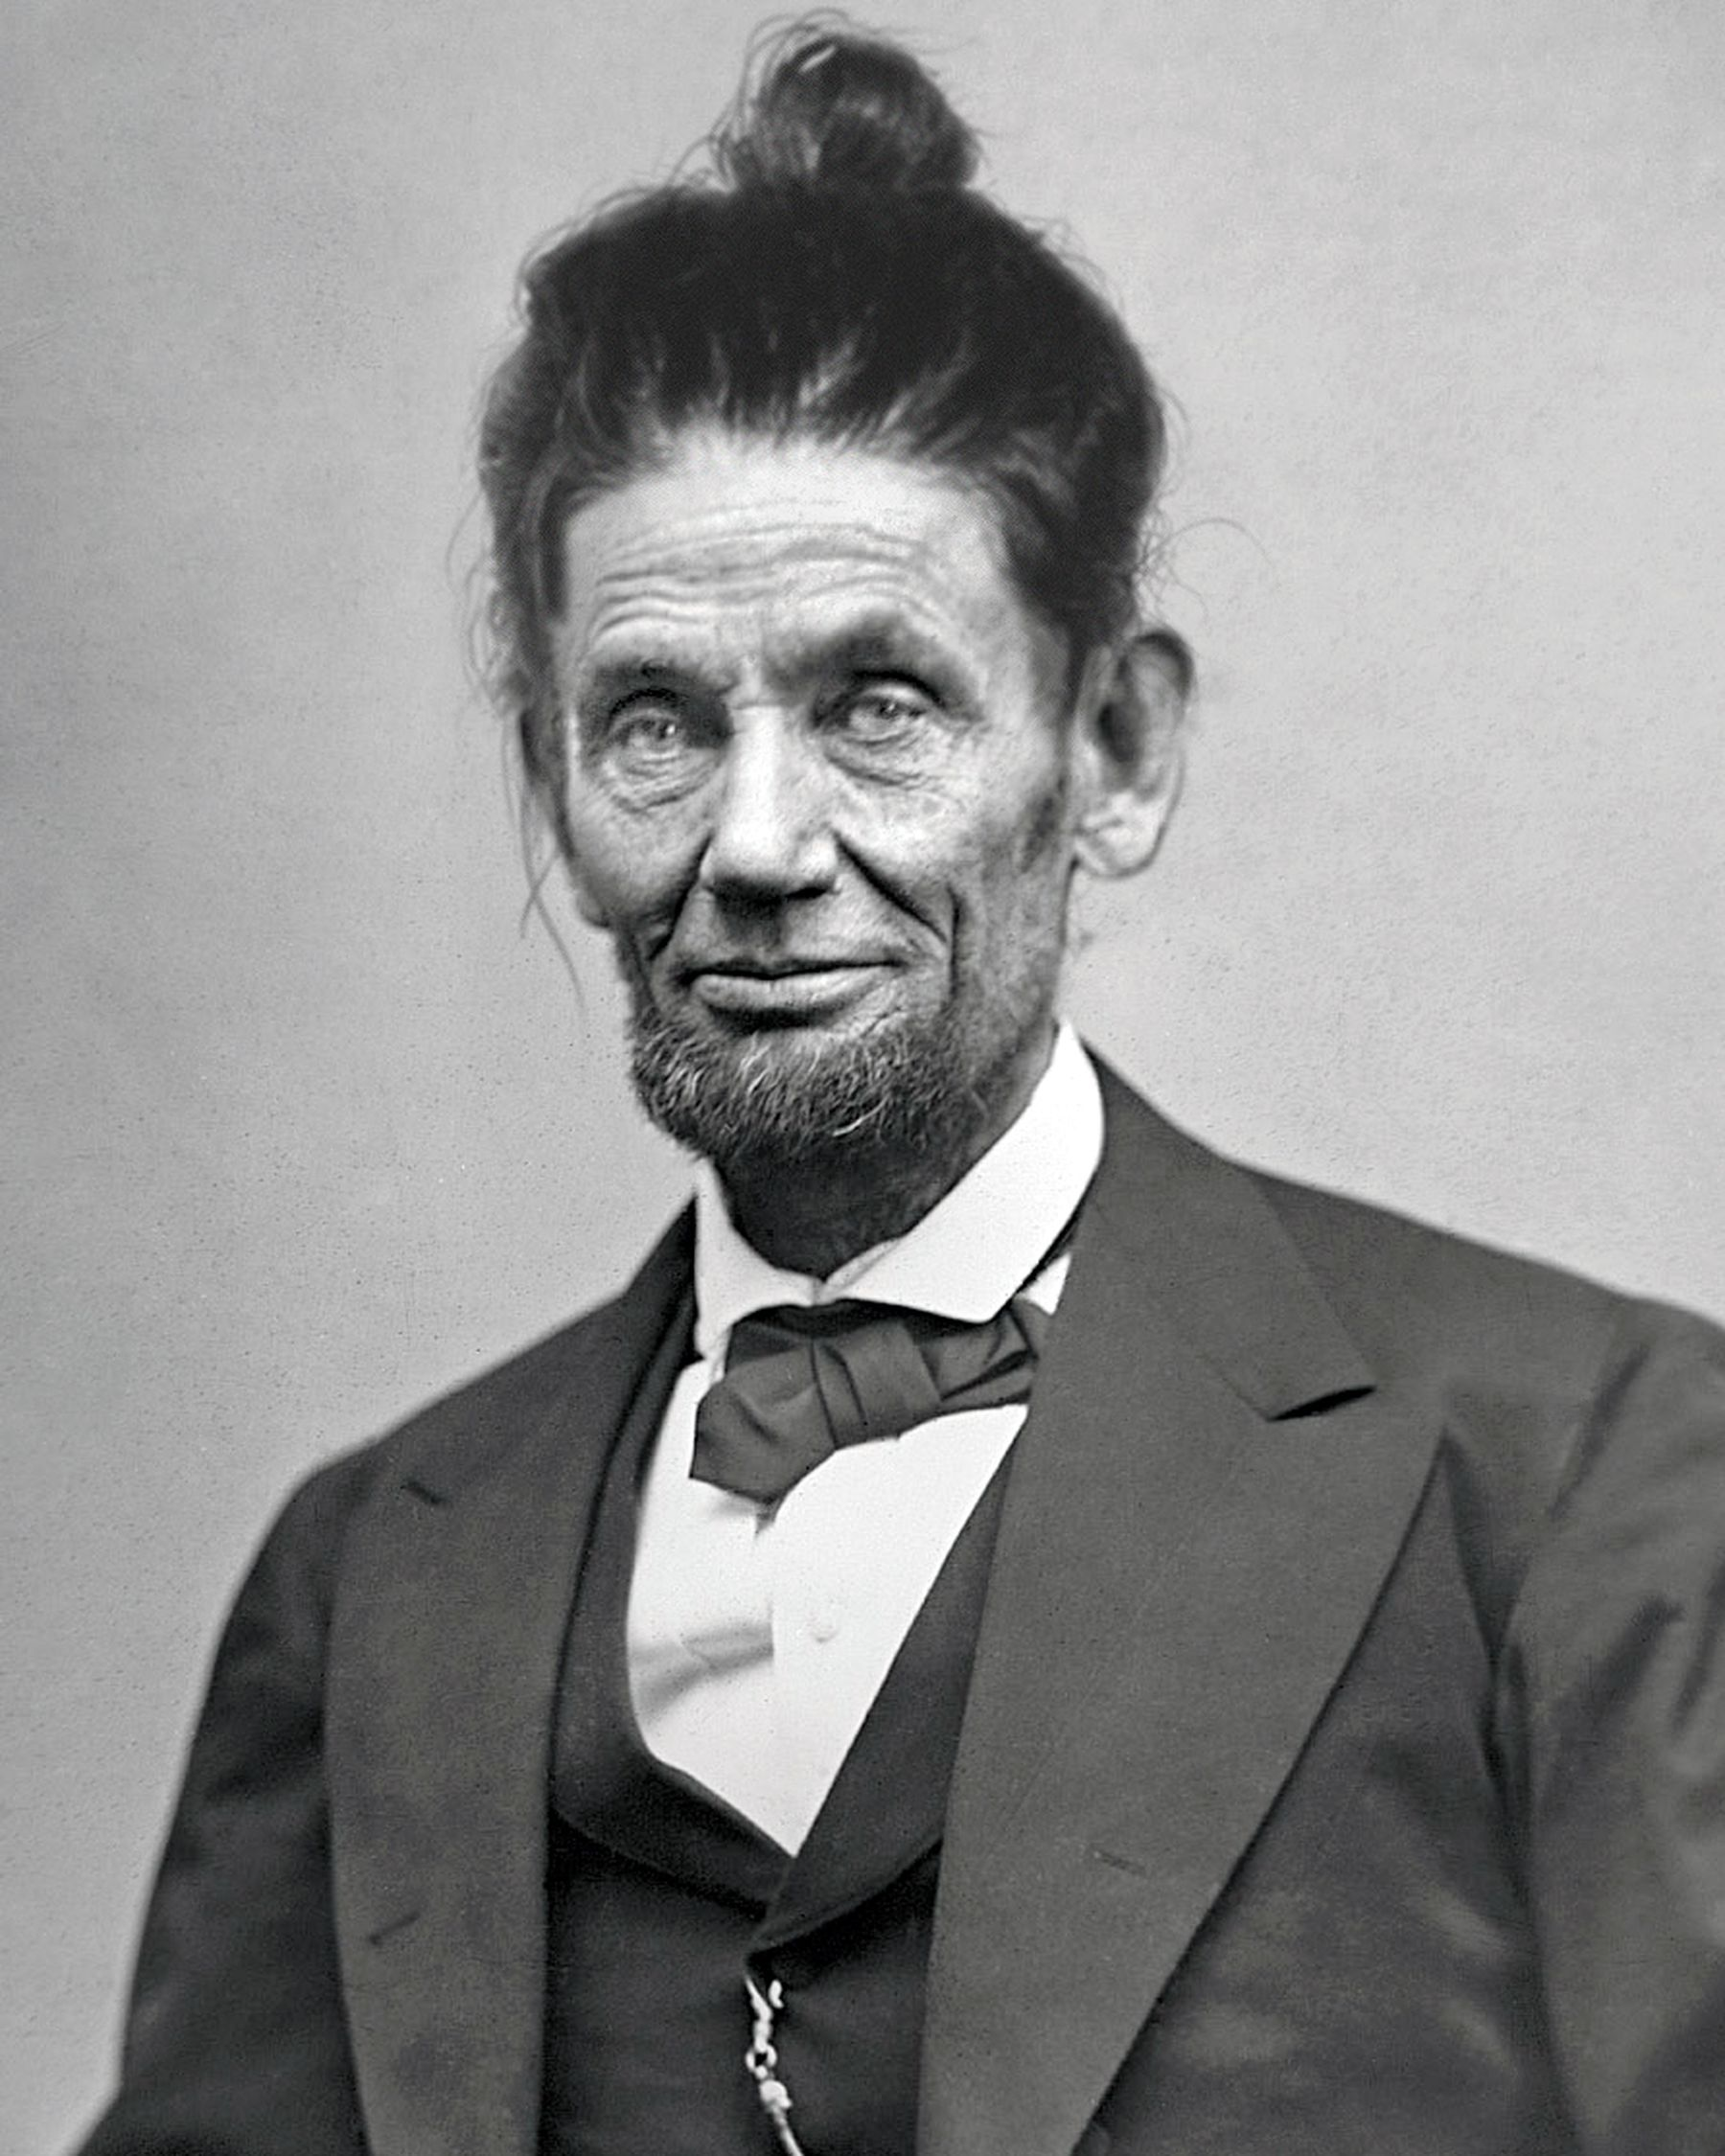 Lincoln with man bun.jpg